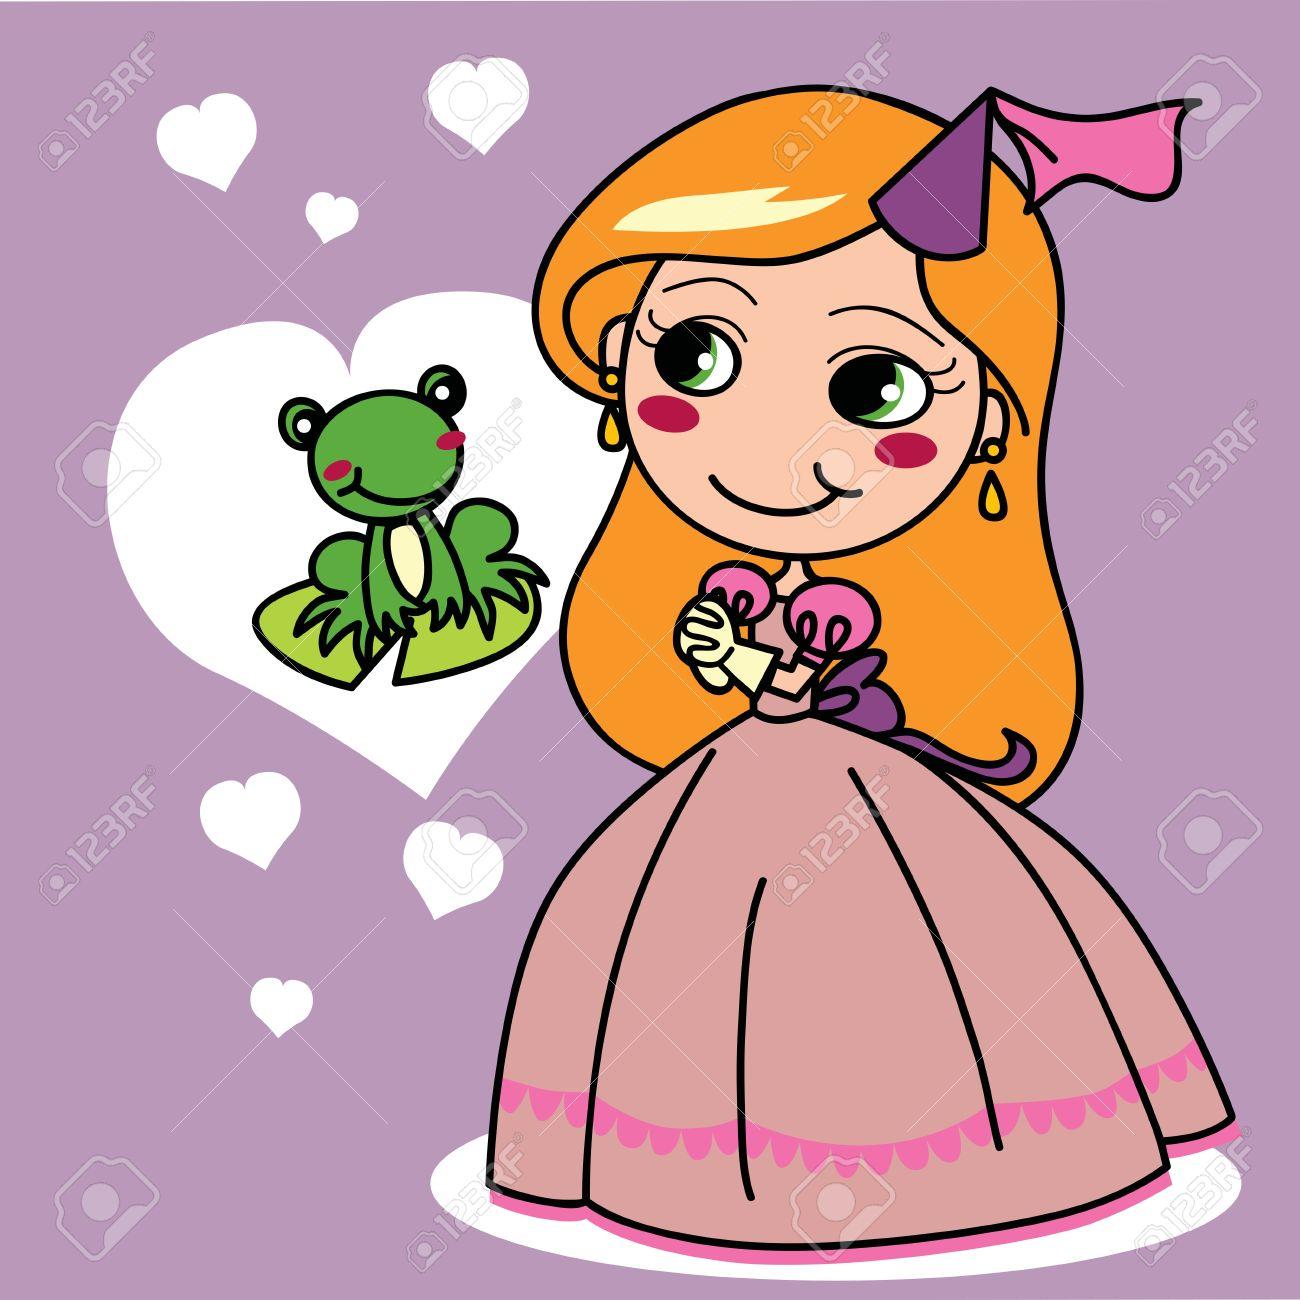 1300x1300 Clipart Girl Kiss A Prince Frog